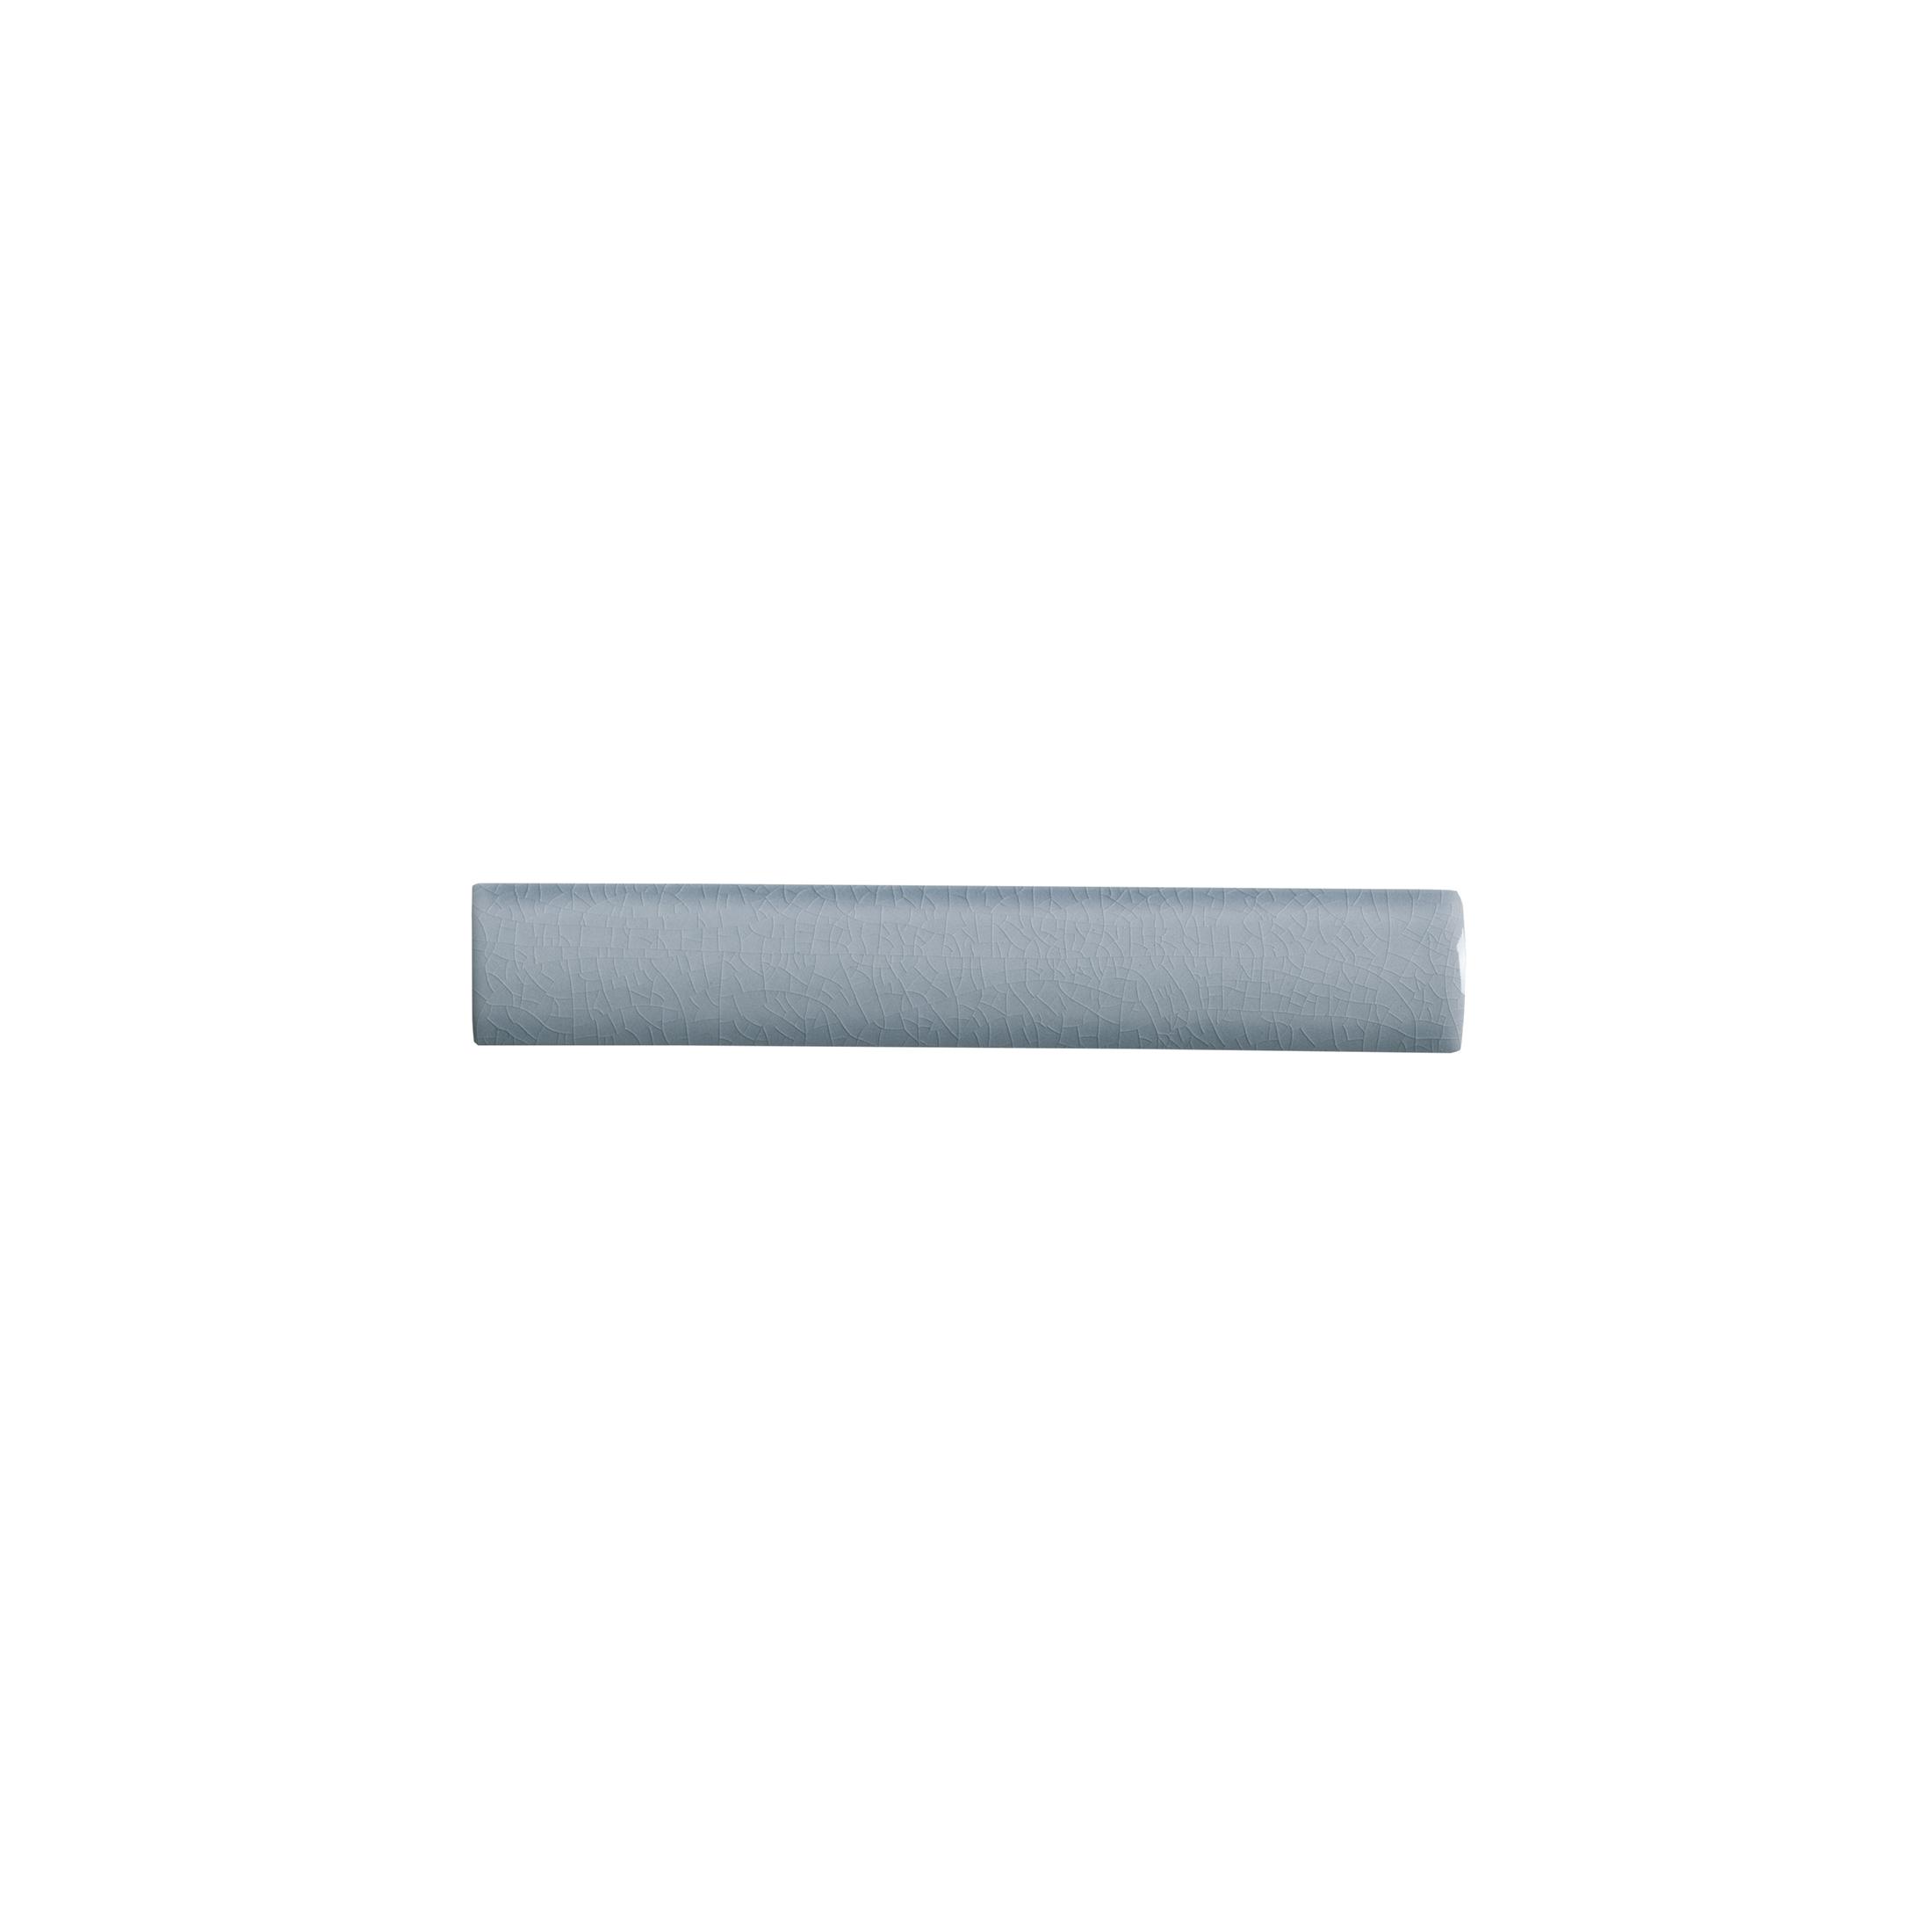 ADMO5433 - CUBRECANTO PB C/C - 2.5 cm X 15 cm